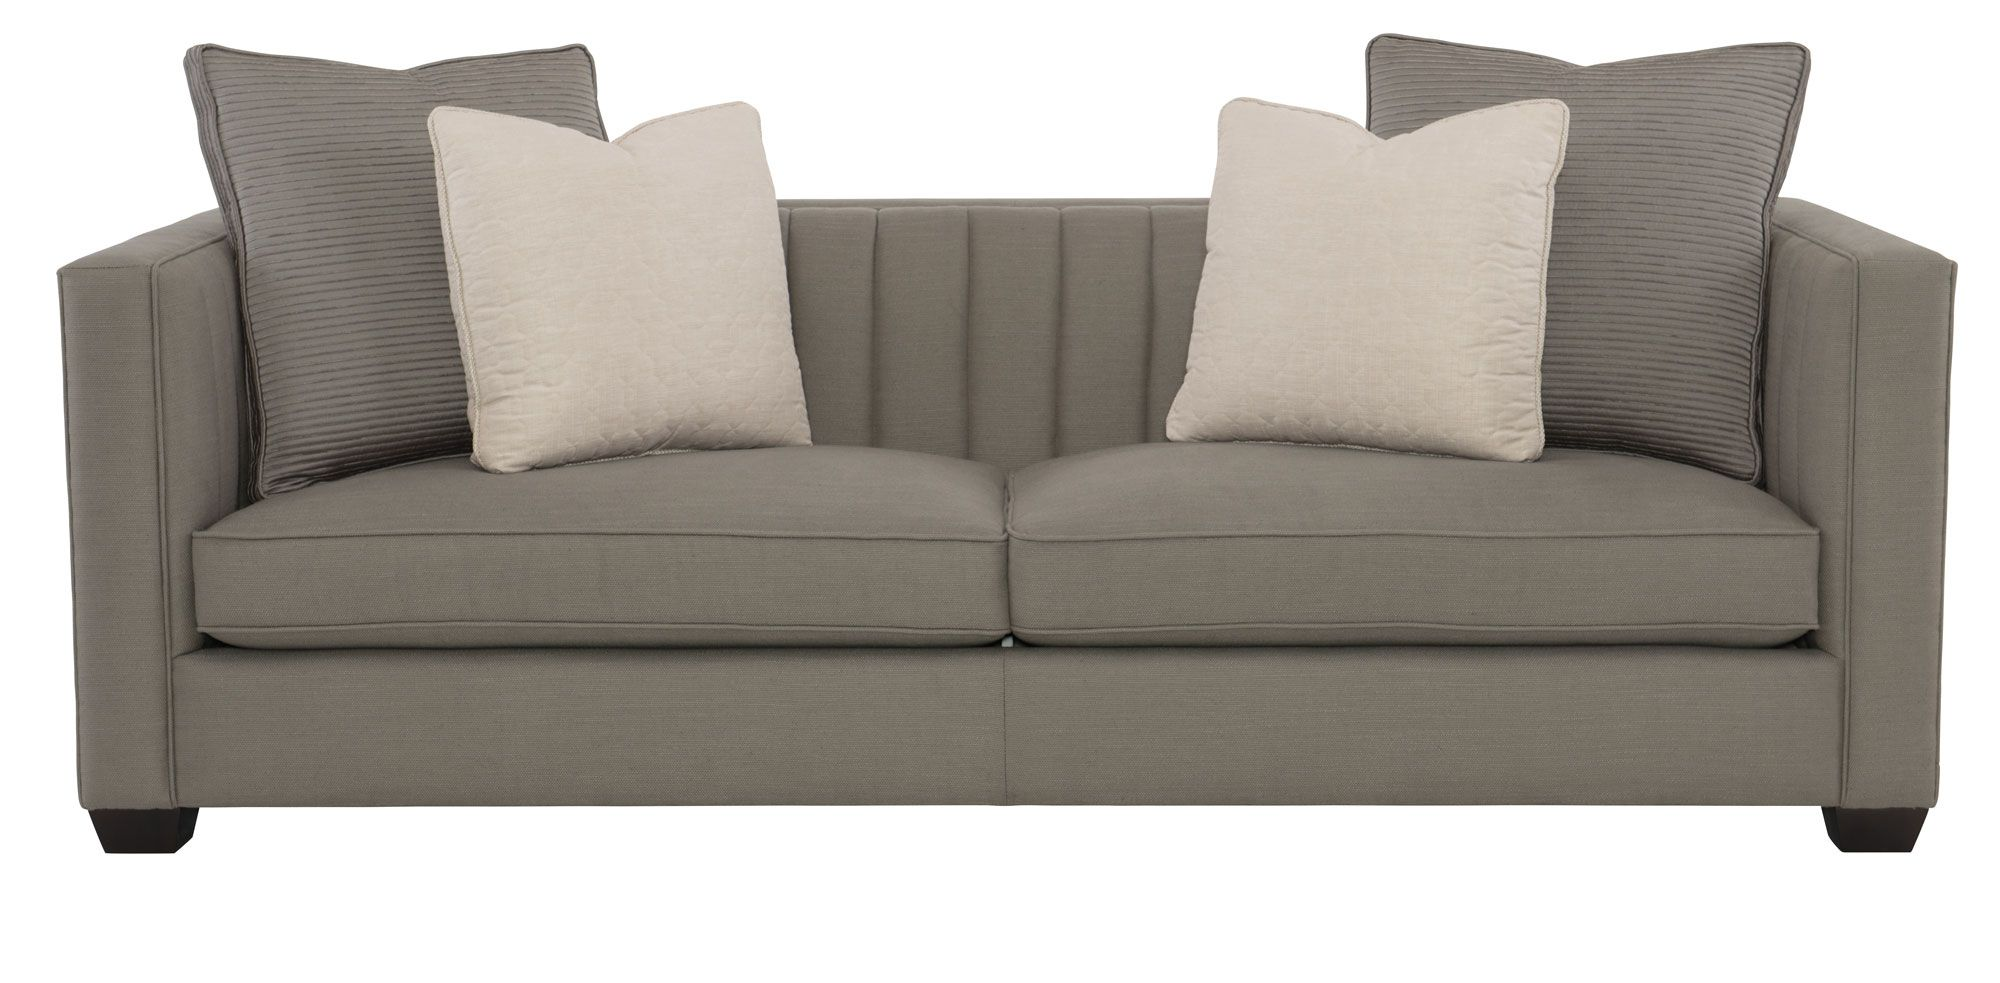 Sofa Style Arm slope tight base no skirt